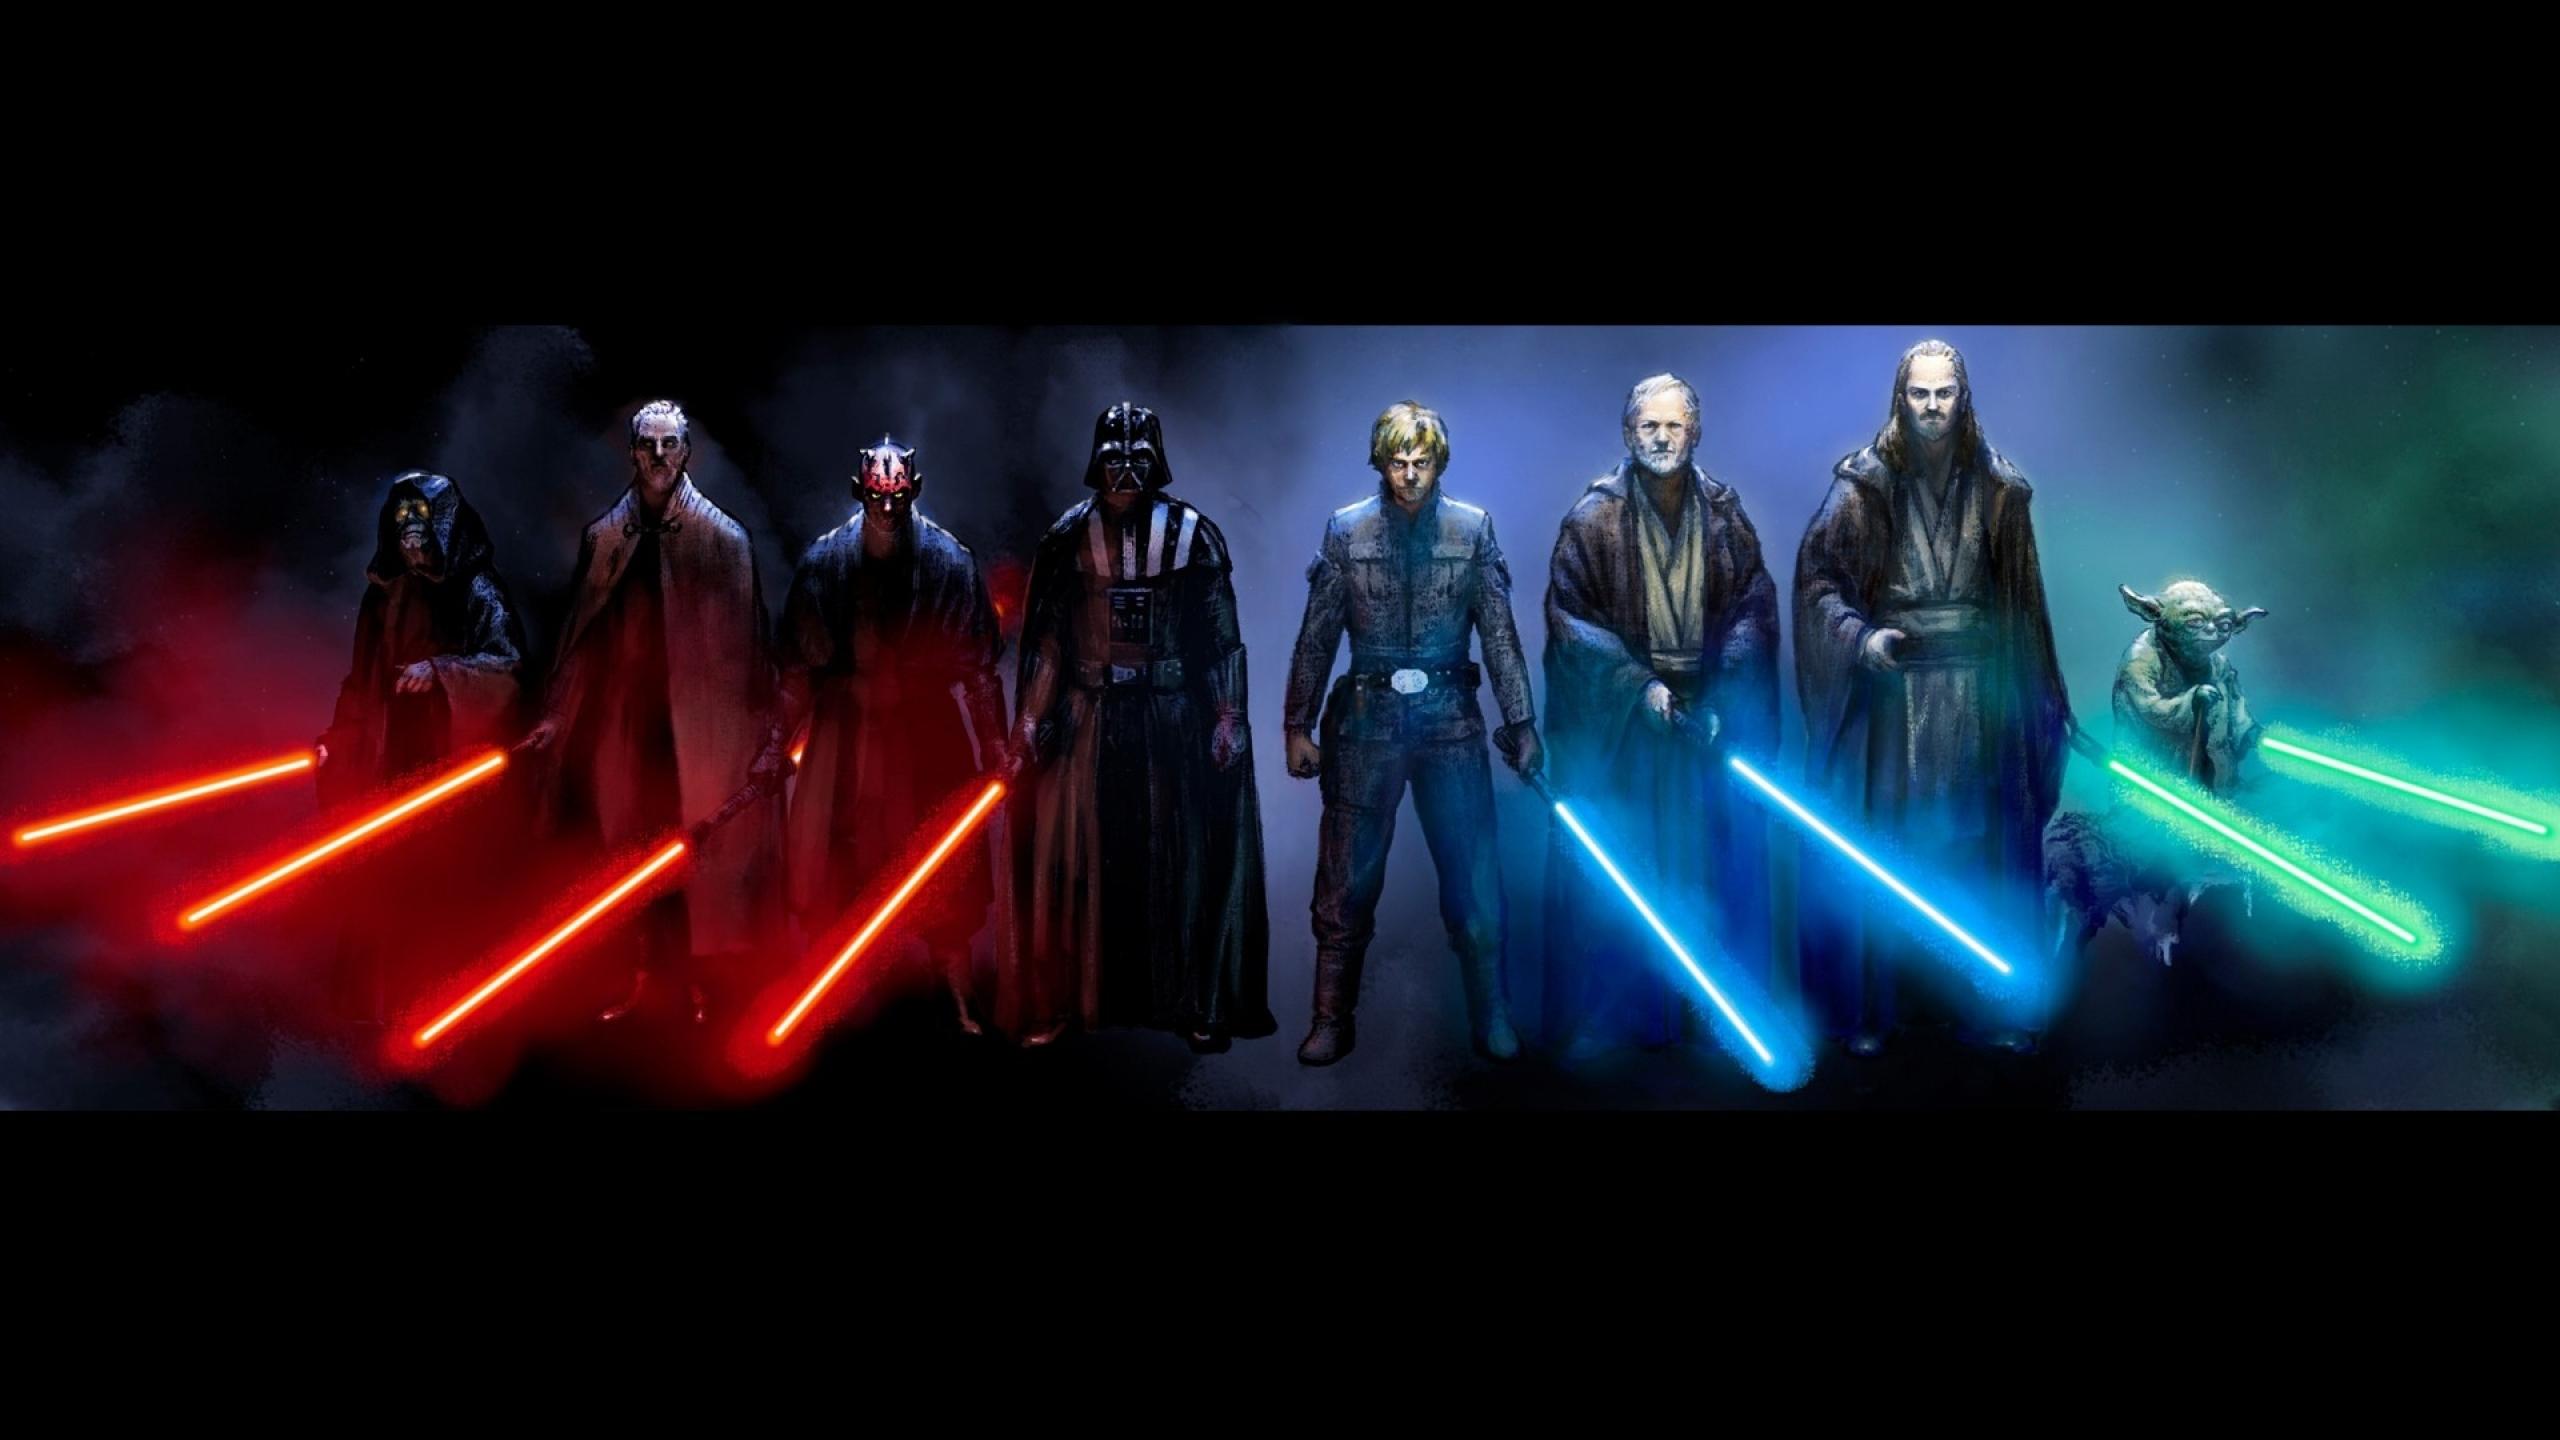 sith jedi luke skywalker light sabers 1920x1080 wallpaper Wallpaper HD 2560x1440